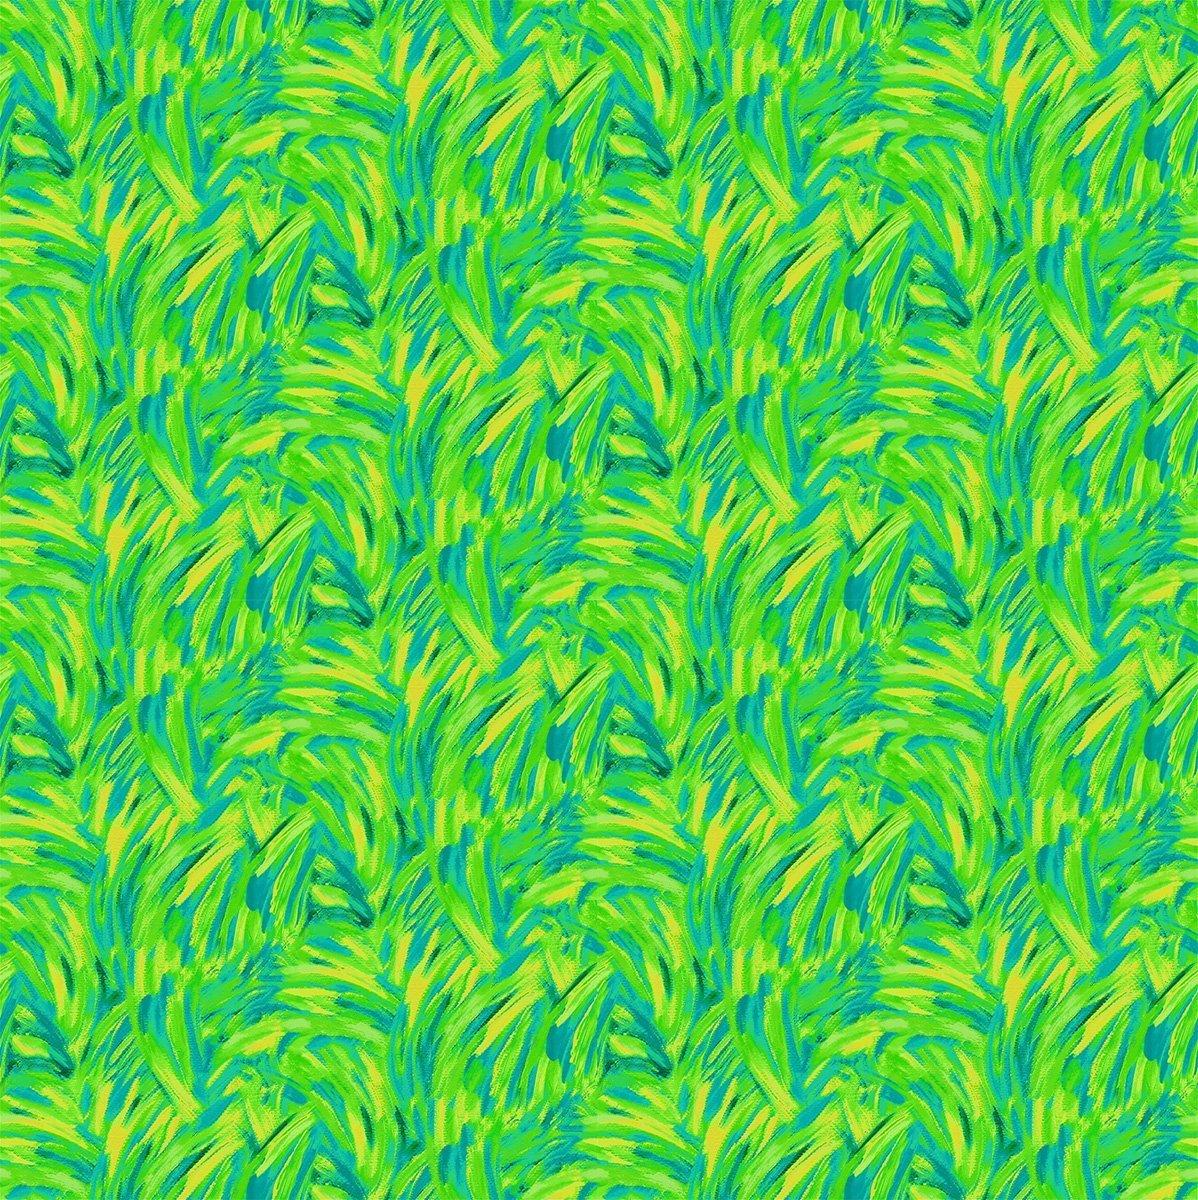 Flamingo Abstract Green Yellow